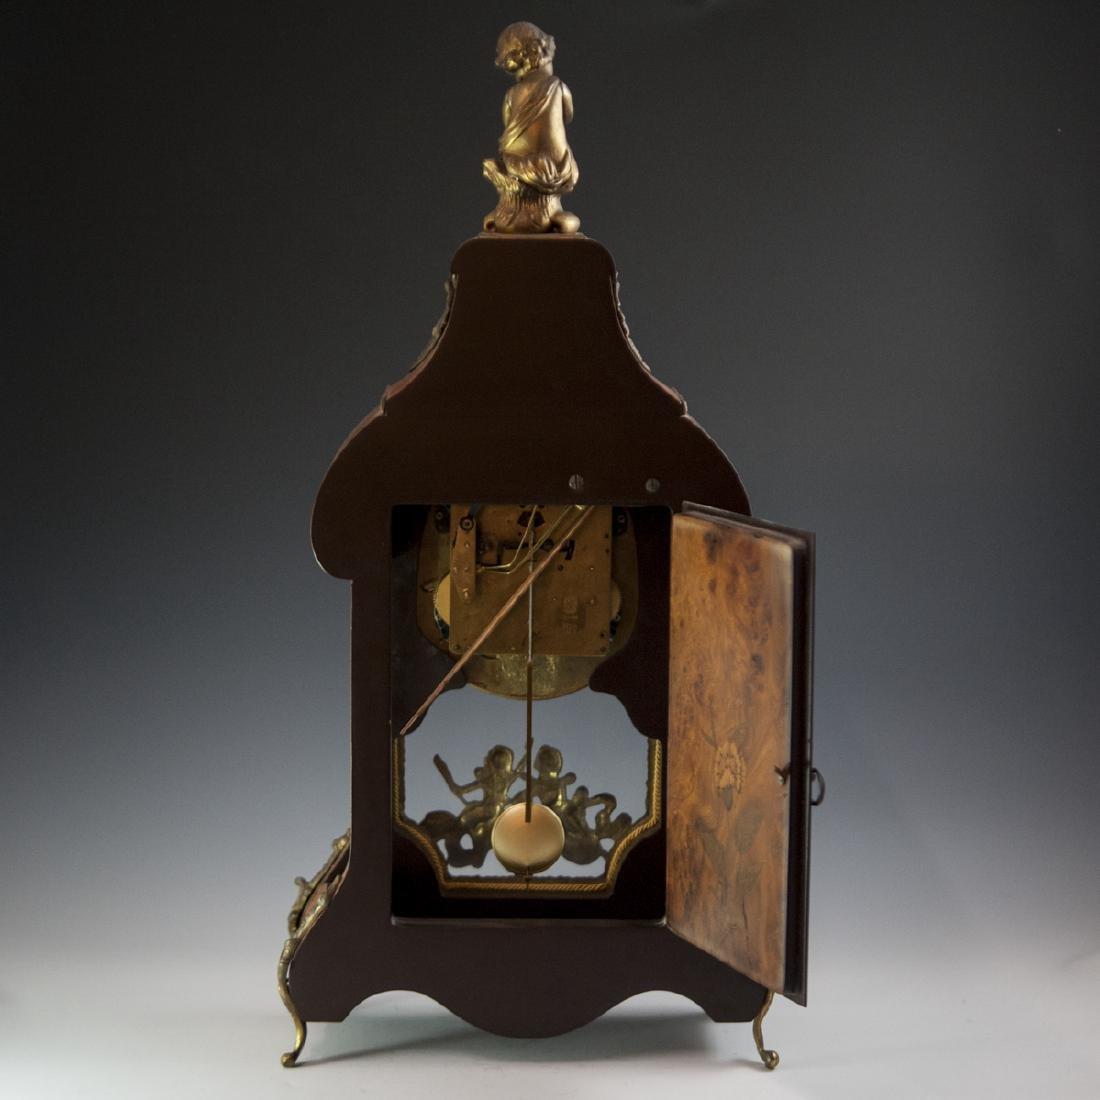 Franz Hermle and Sohn Marquetry & Bronze Mantel Clock - 2